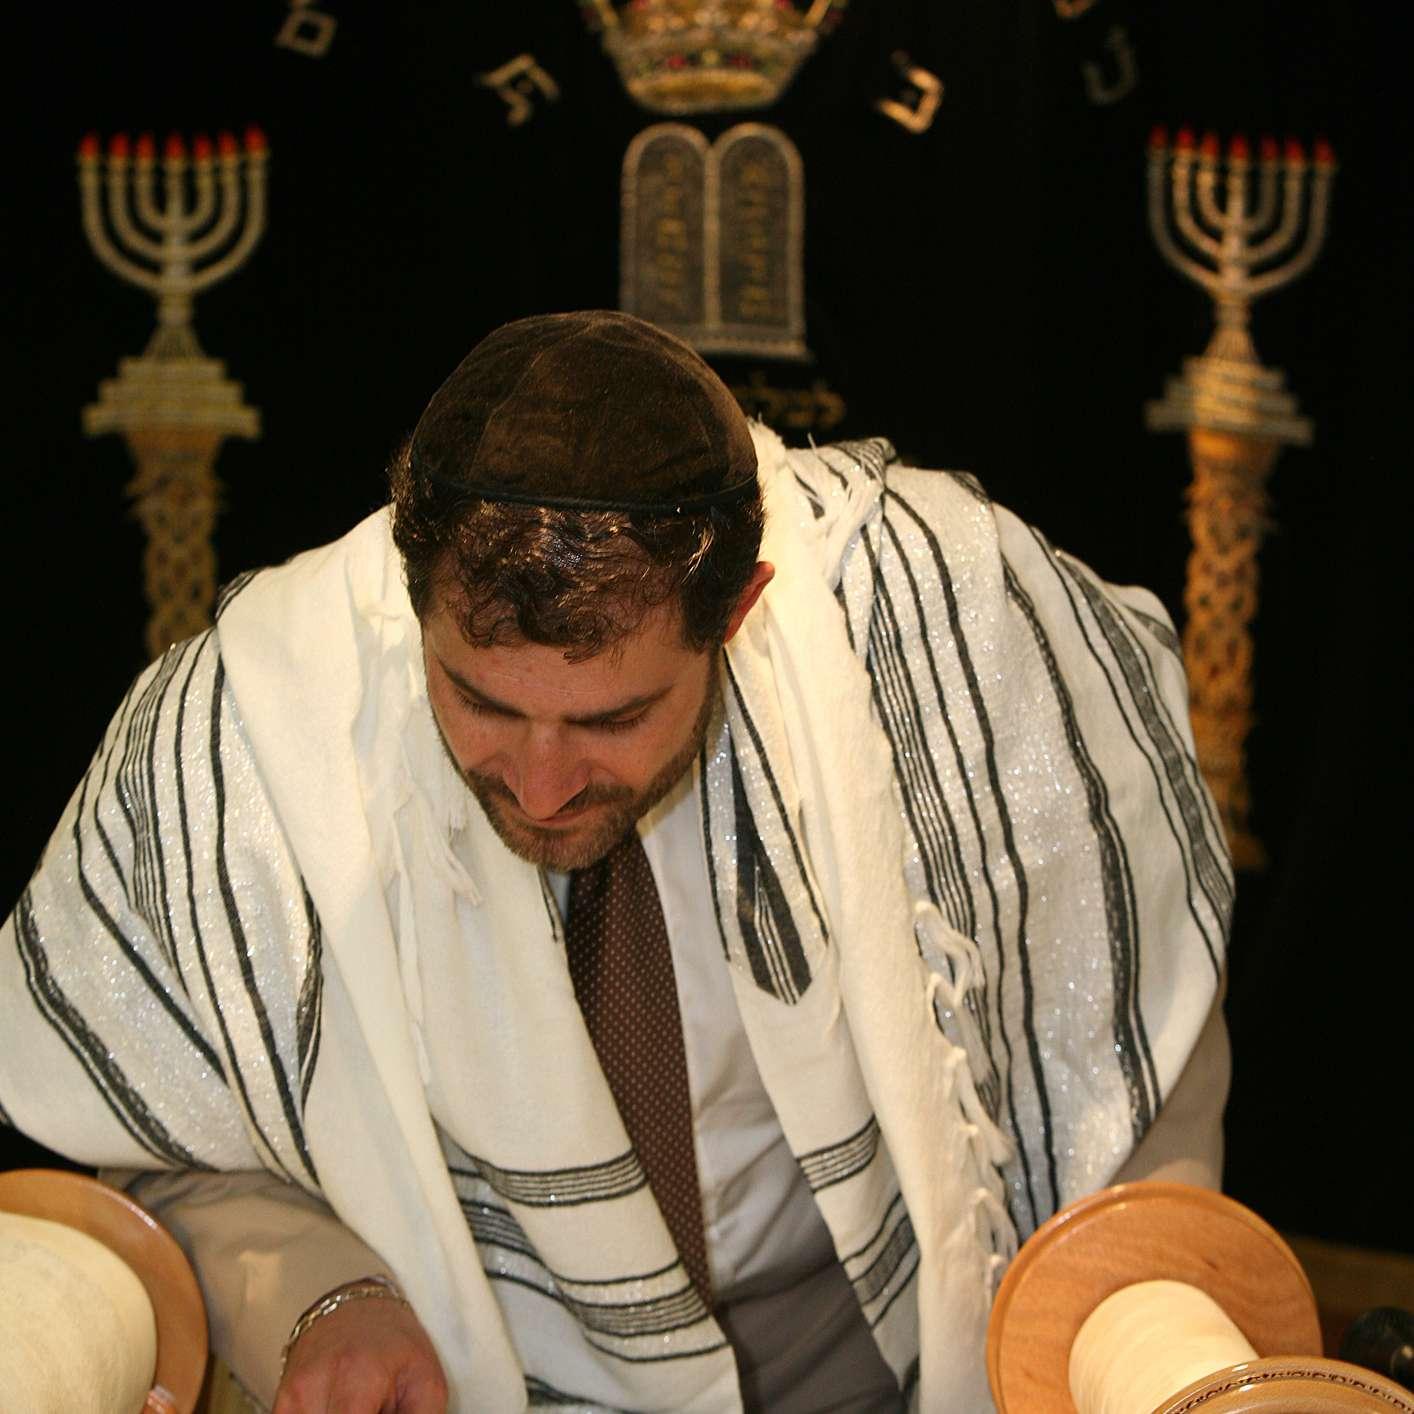 Groom-to-be reading Torah